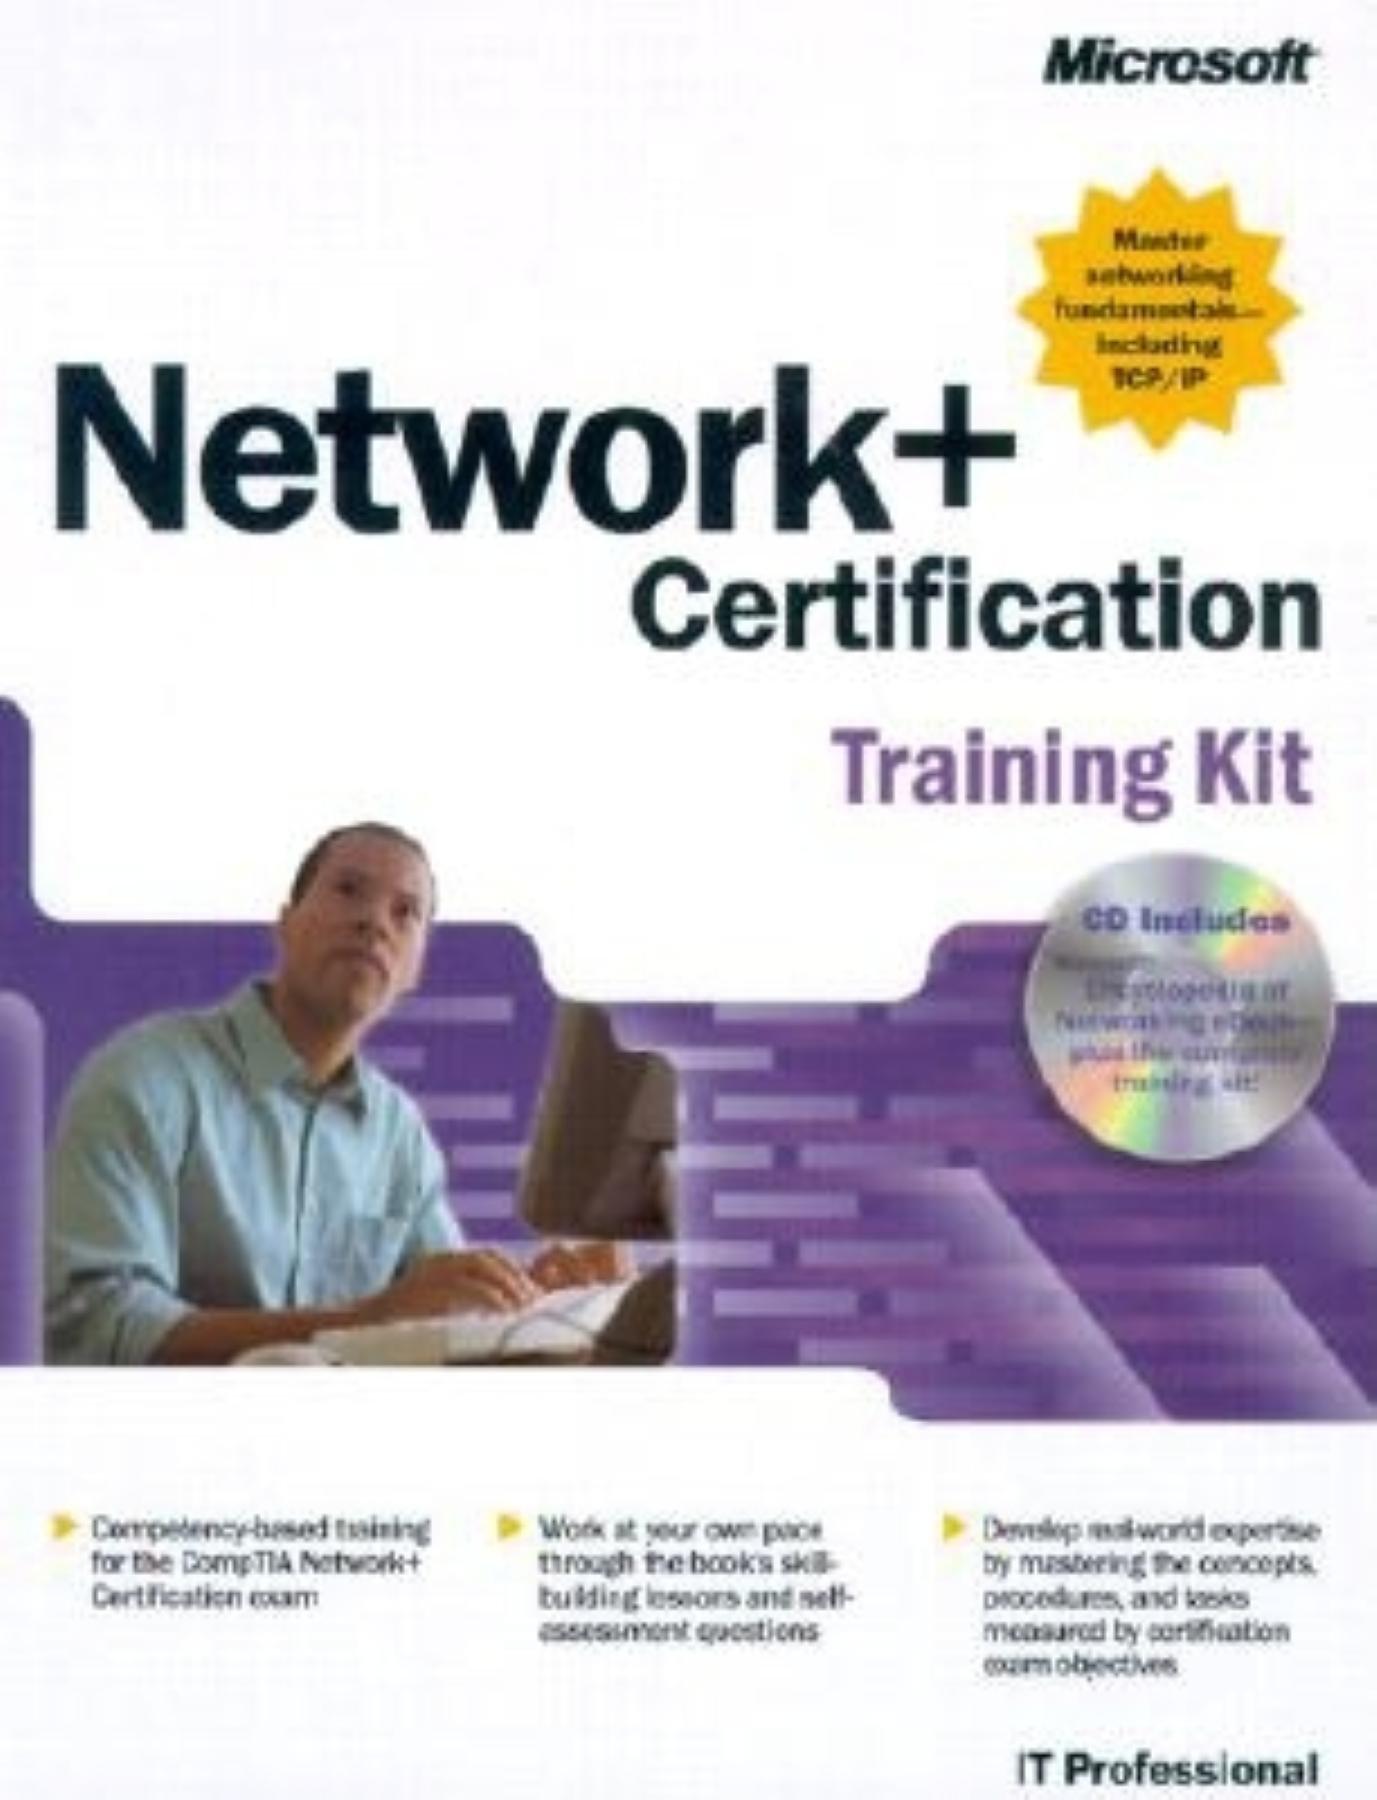 Network certification training kit pro certification microsoft network certification training kit pro certification microsoft press microsoft corporation 9780735613461 amazon books 1betcityfo Images